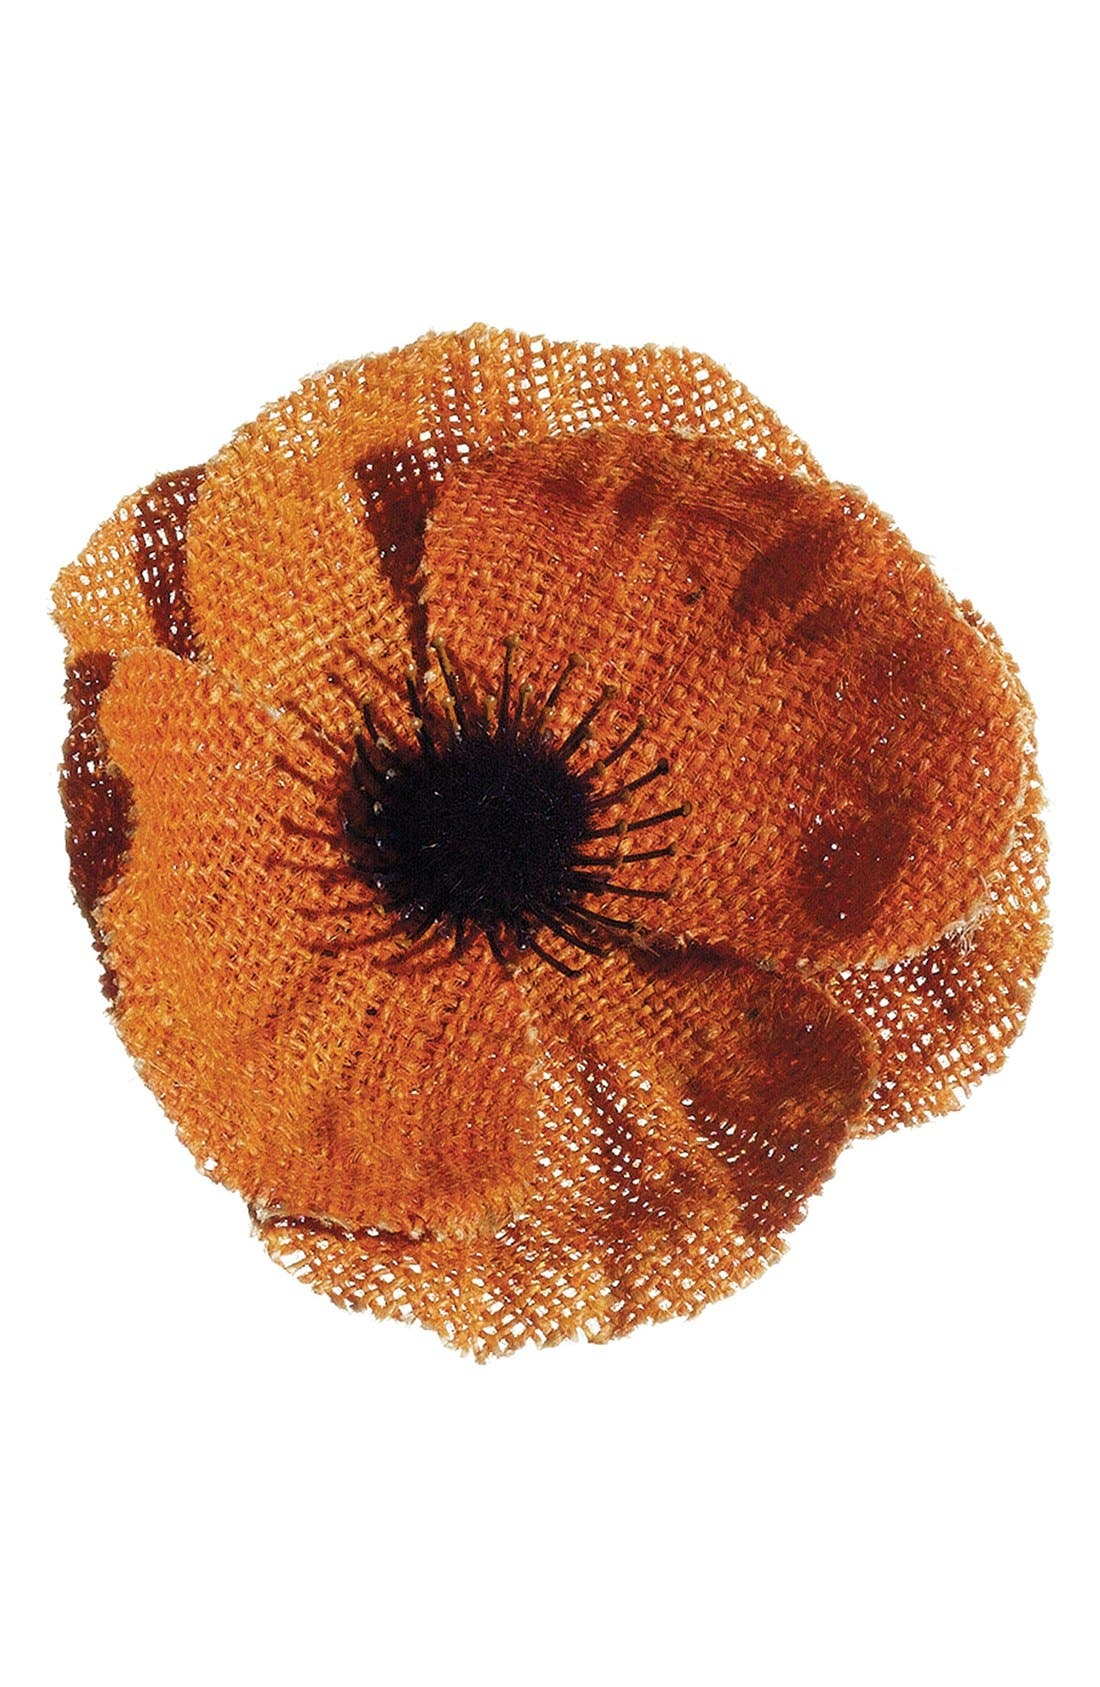 Main Image - ALLSTATE 'Poppy' Burlap Napkin Ring